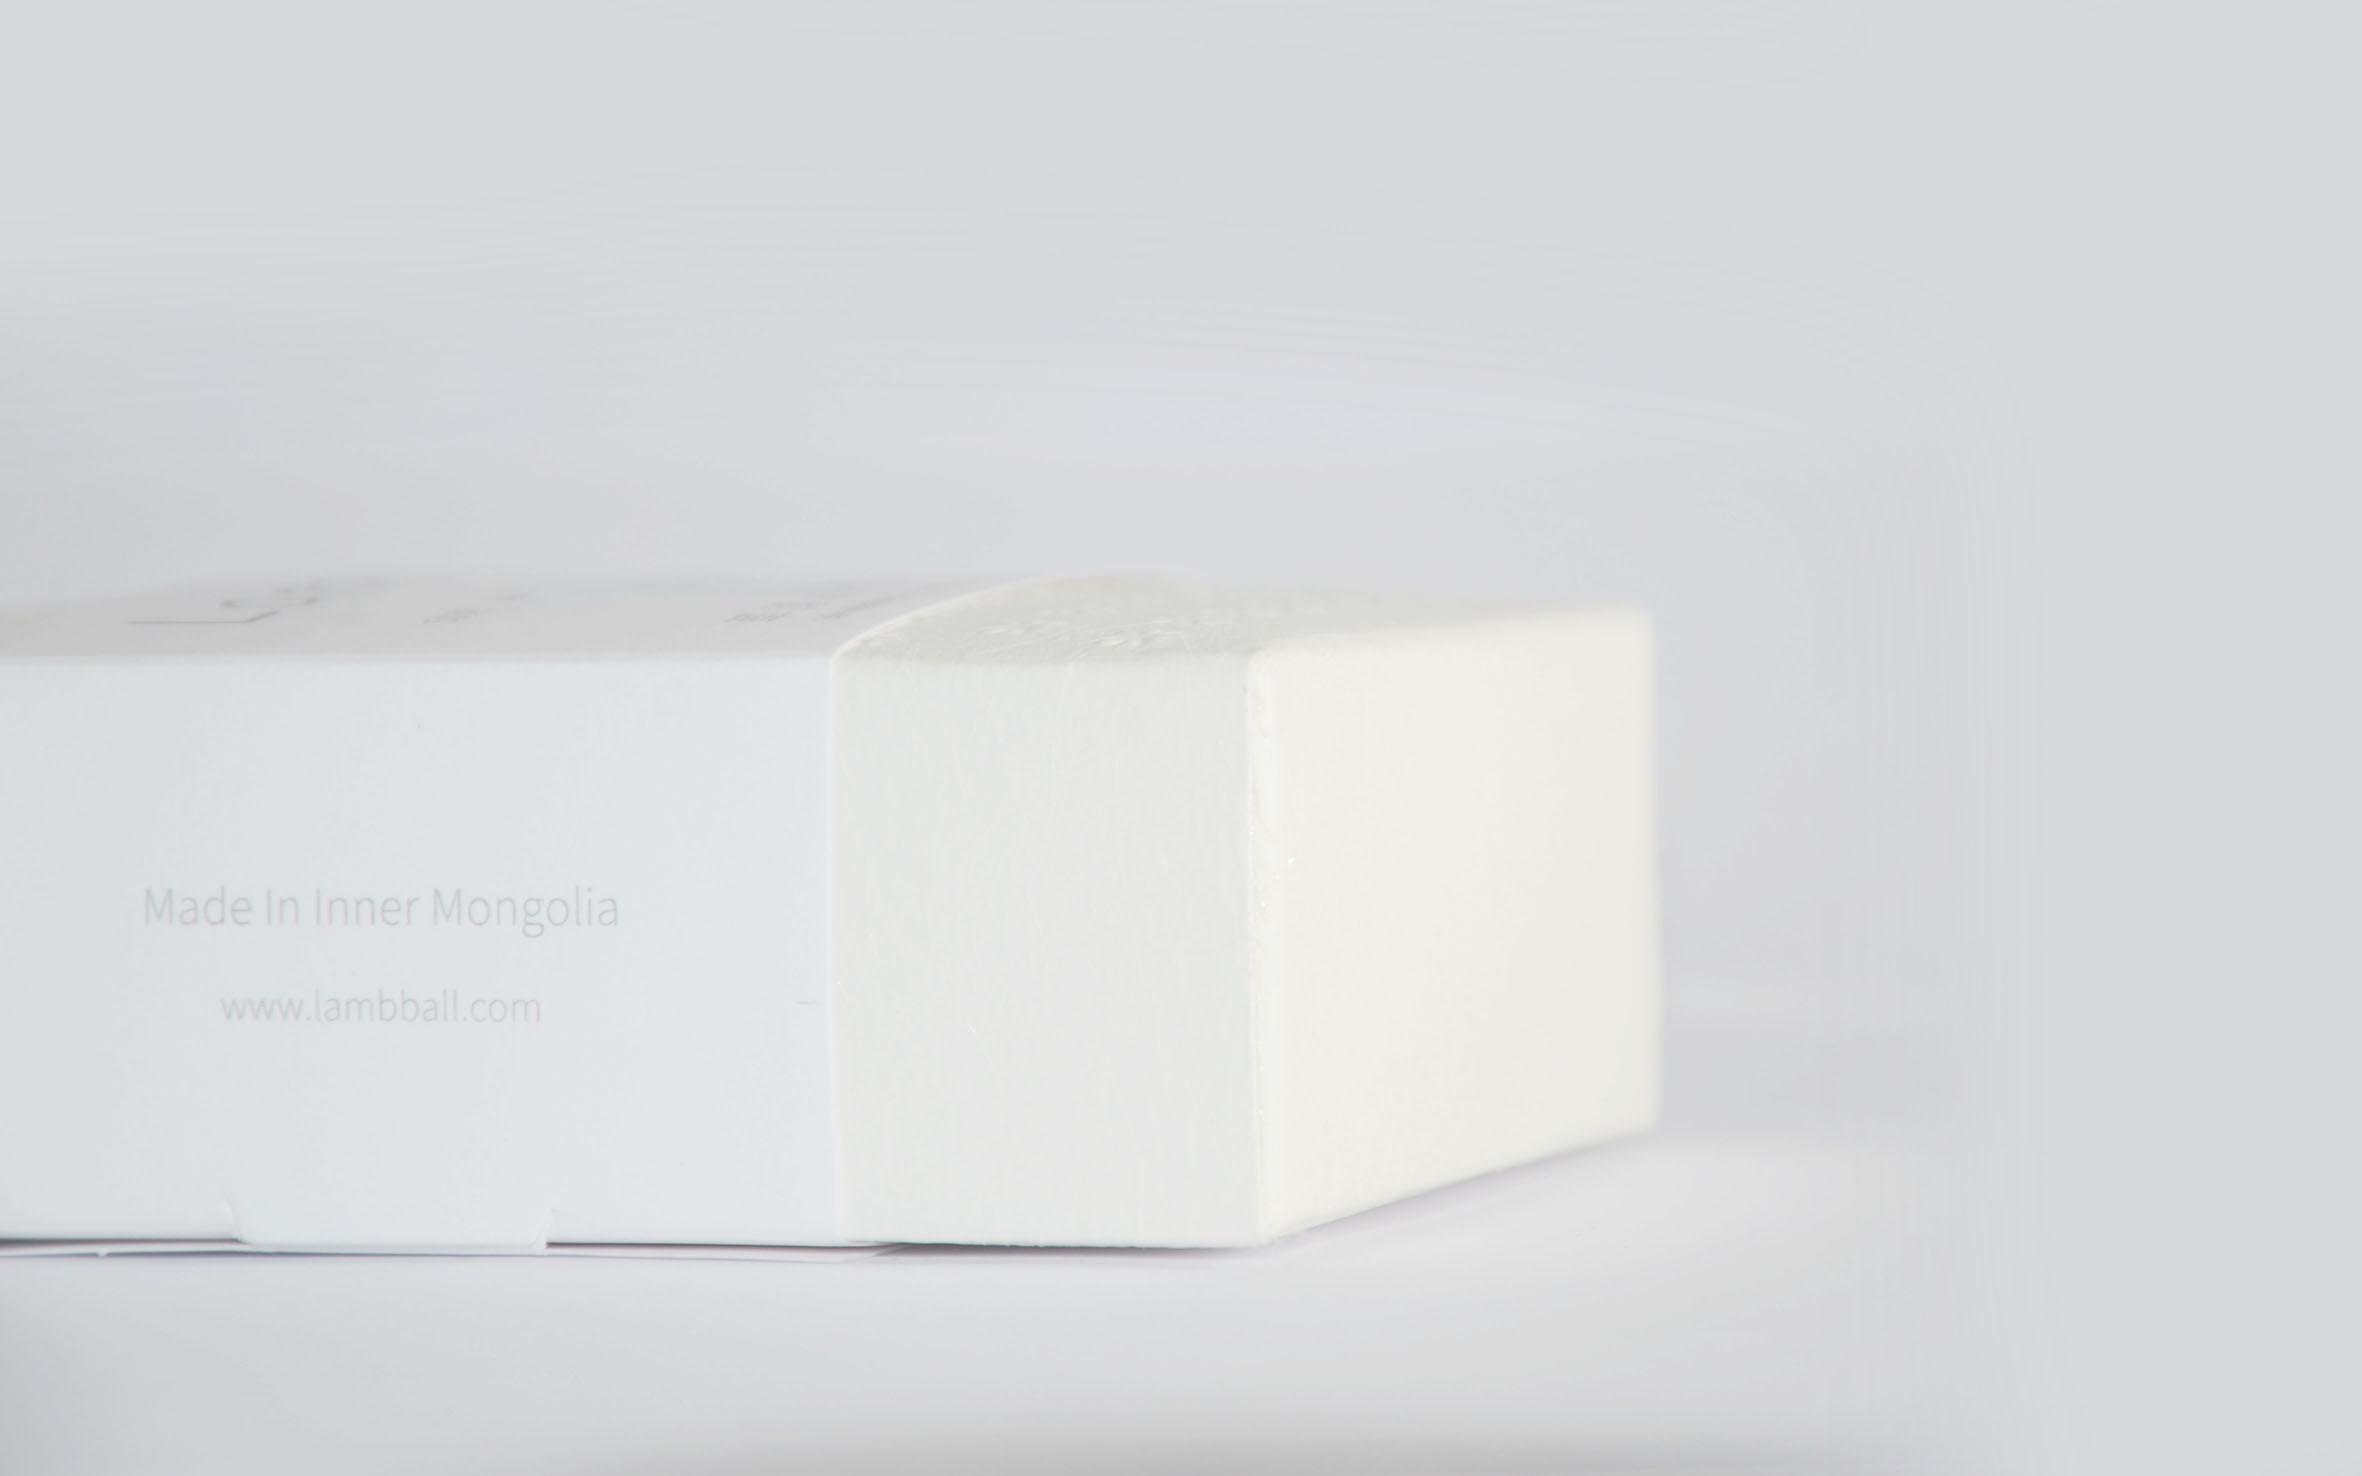 lambball羊奶皂包装设计 第10张